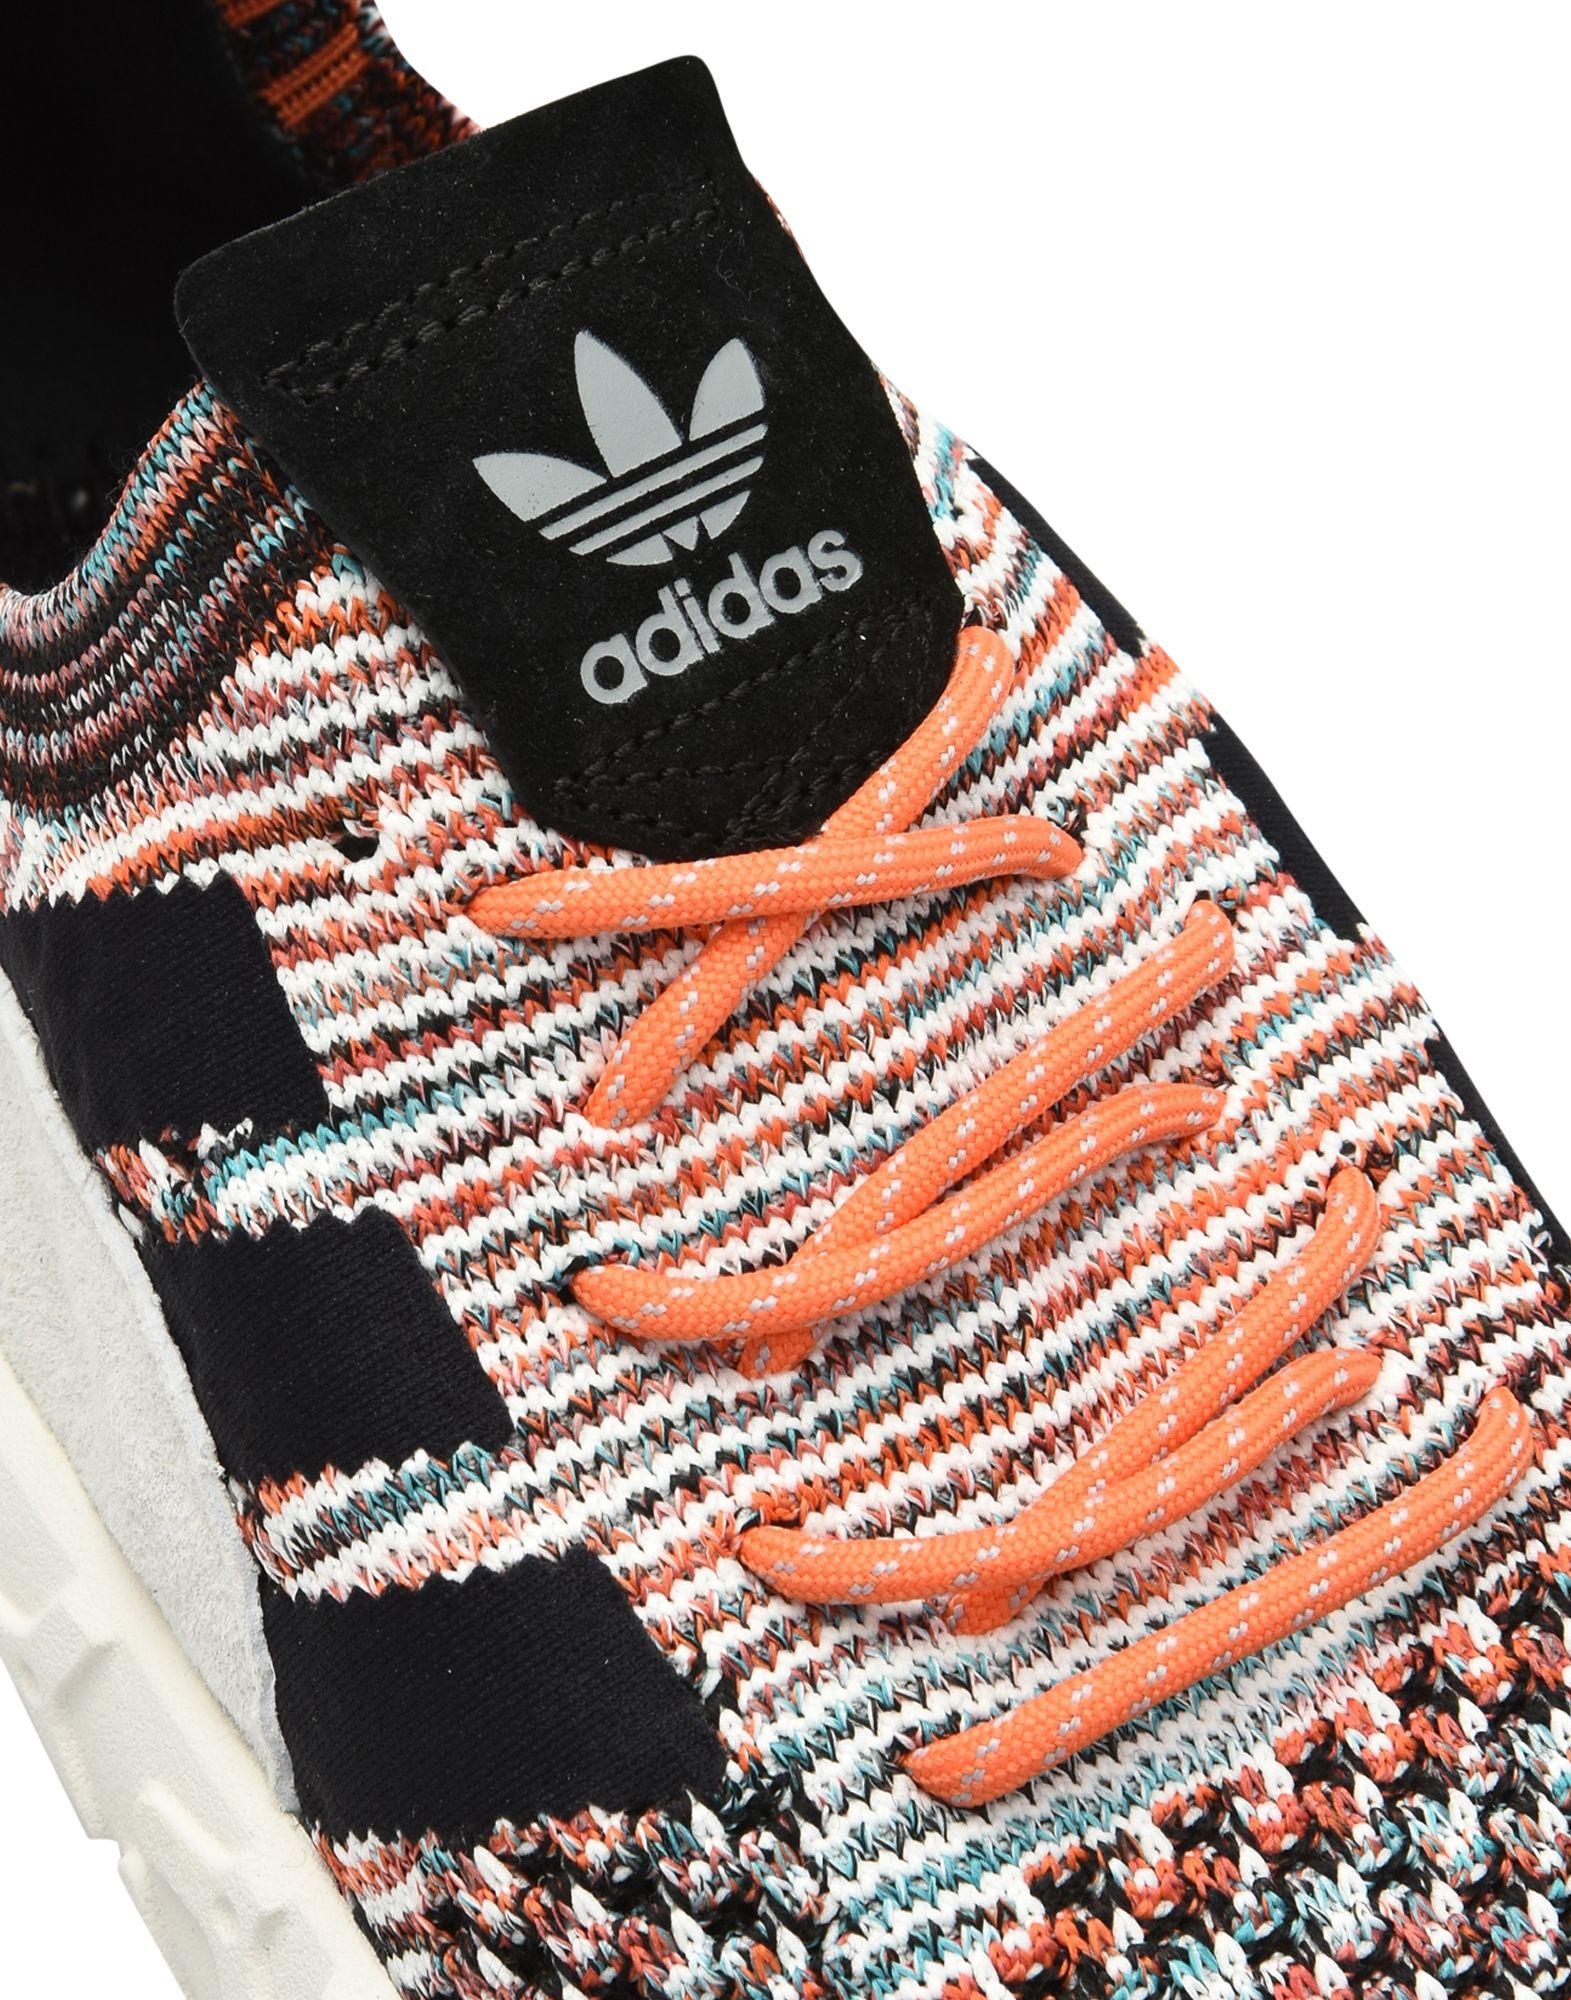 Adidas  Originals Atric F/22 Pk  Adidas 11496728HU Gute Qualität beliebte Schuhe b318df